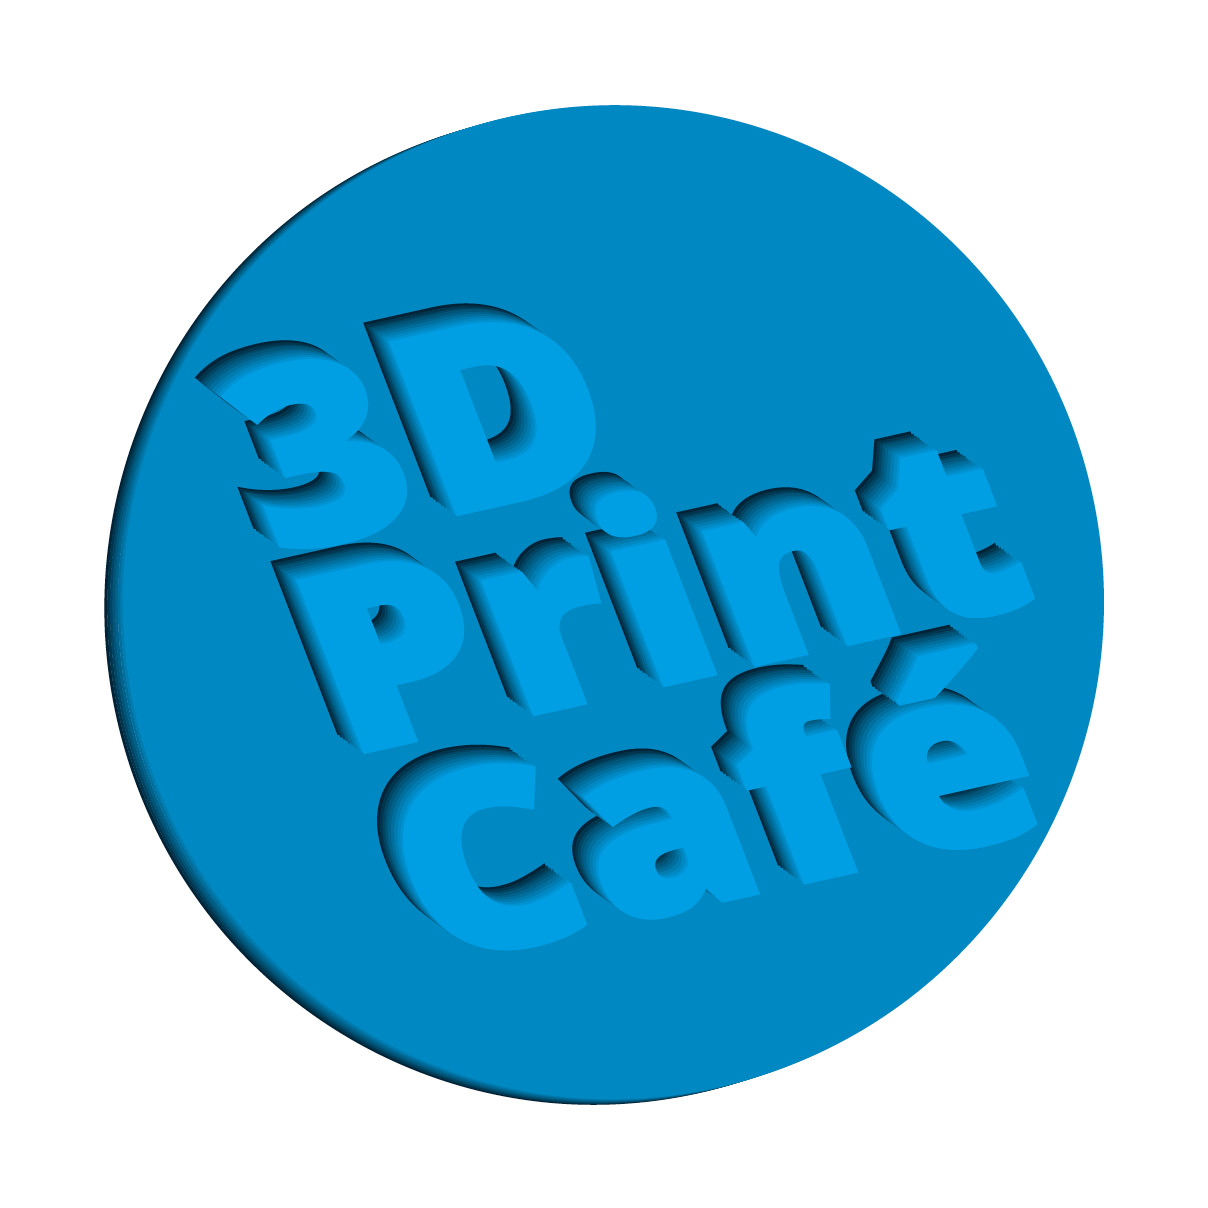 Image-DVP-Cafe7